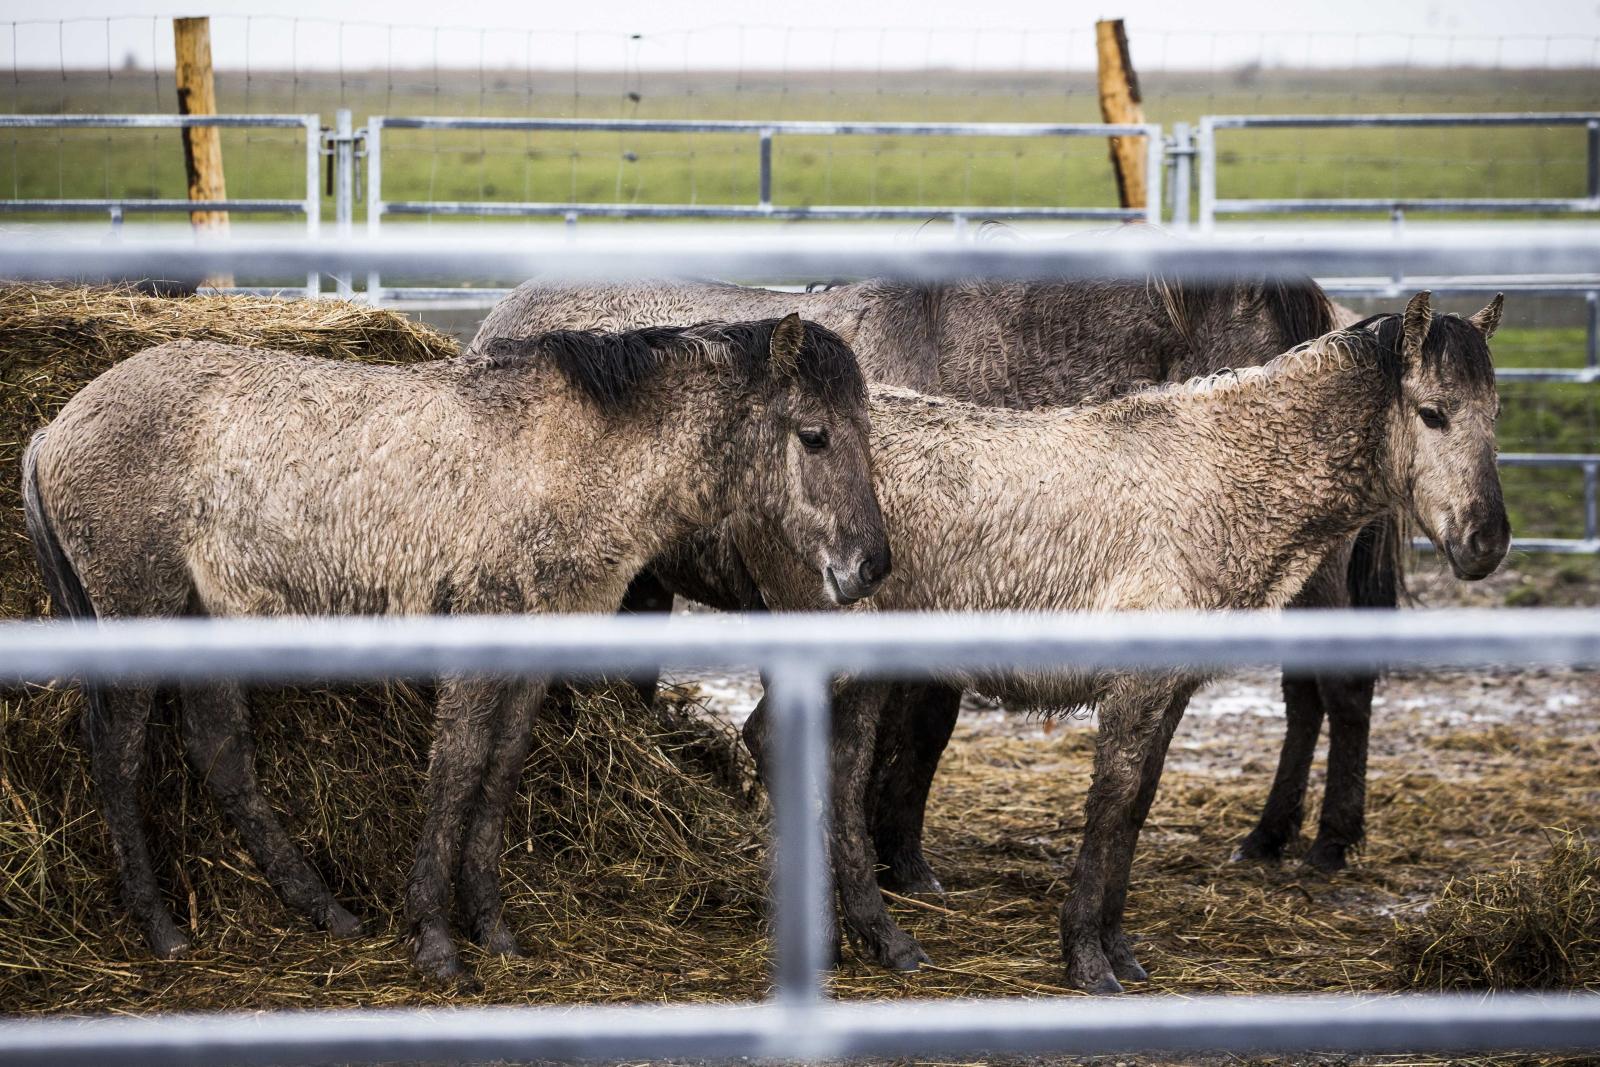 Koniki polskie w Lelystad, Holandia. Fot. PAP/EPA/VINCENT JANNINK